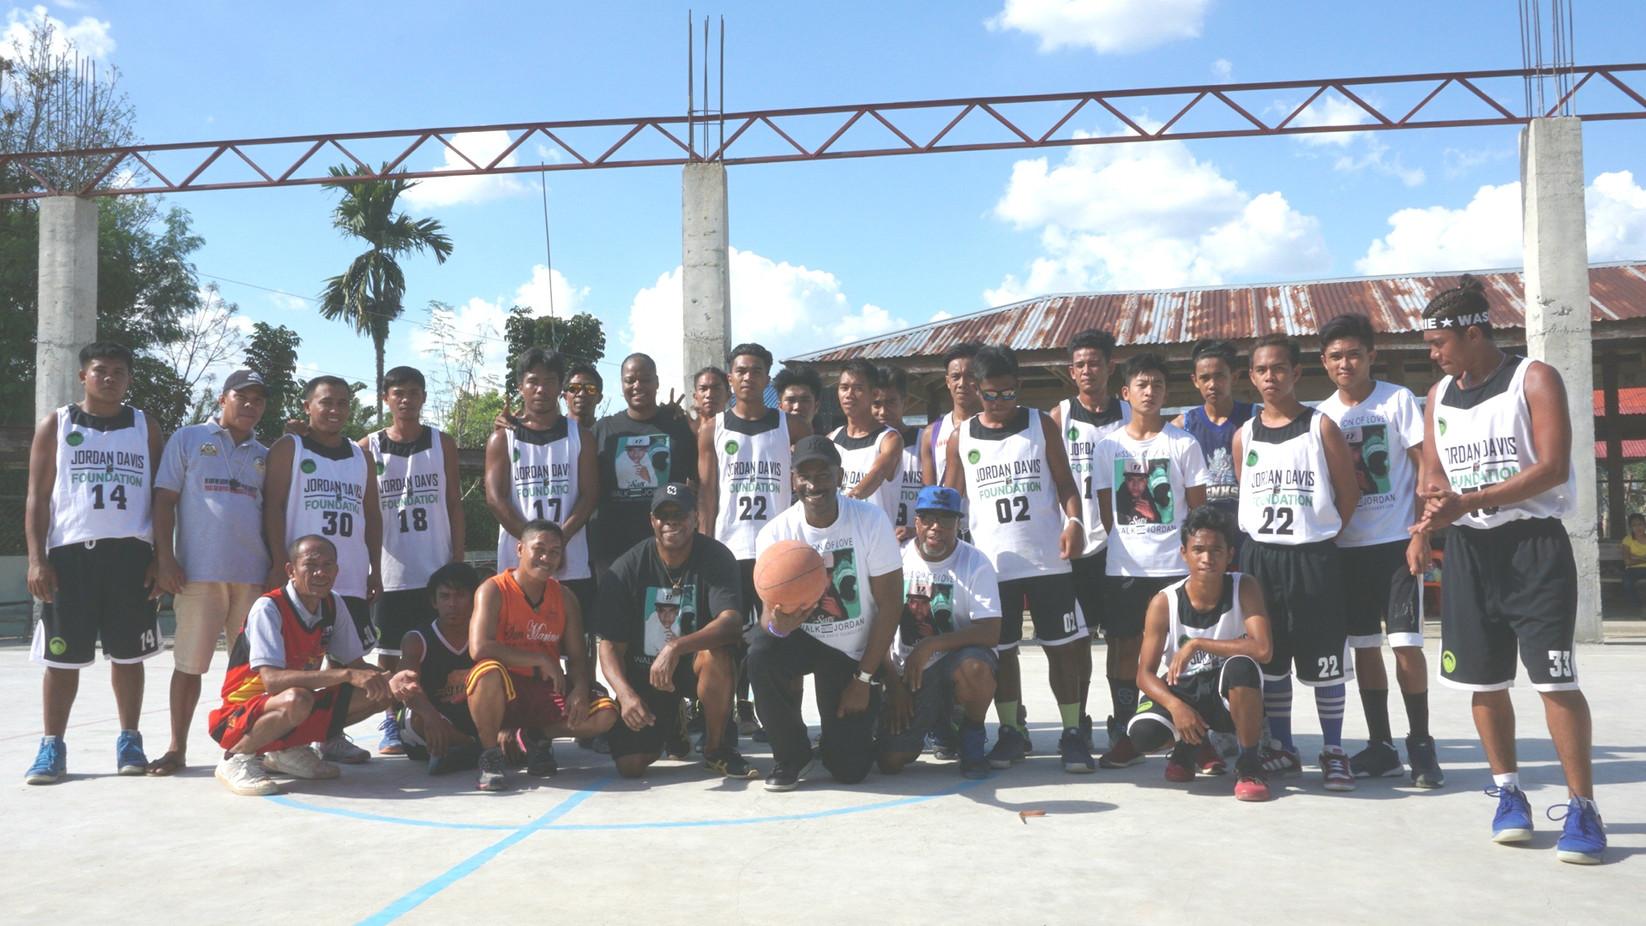 Jordan Davis Basketball Tourney / Philippines